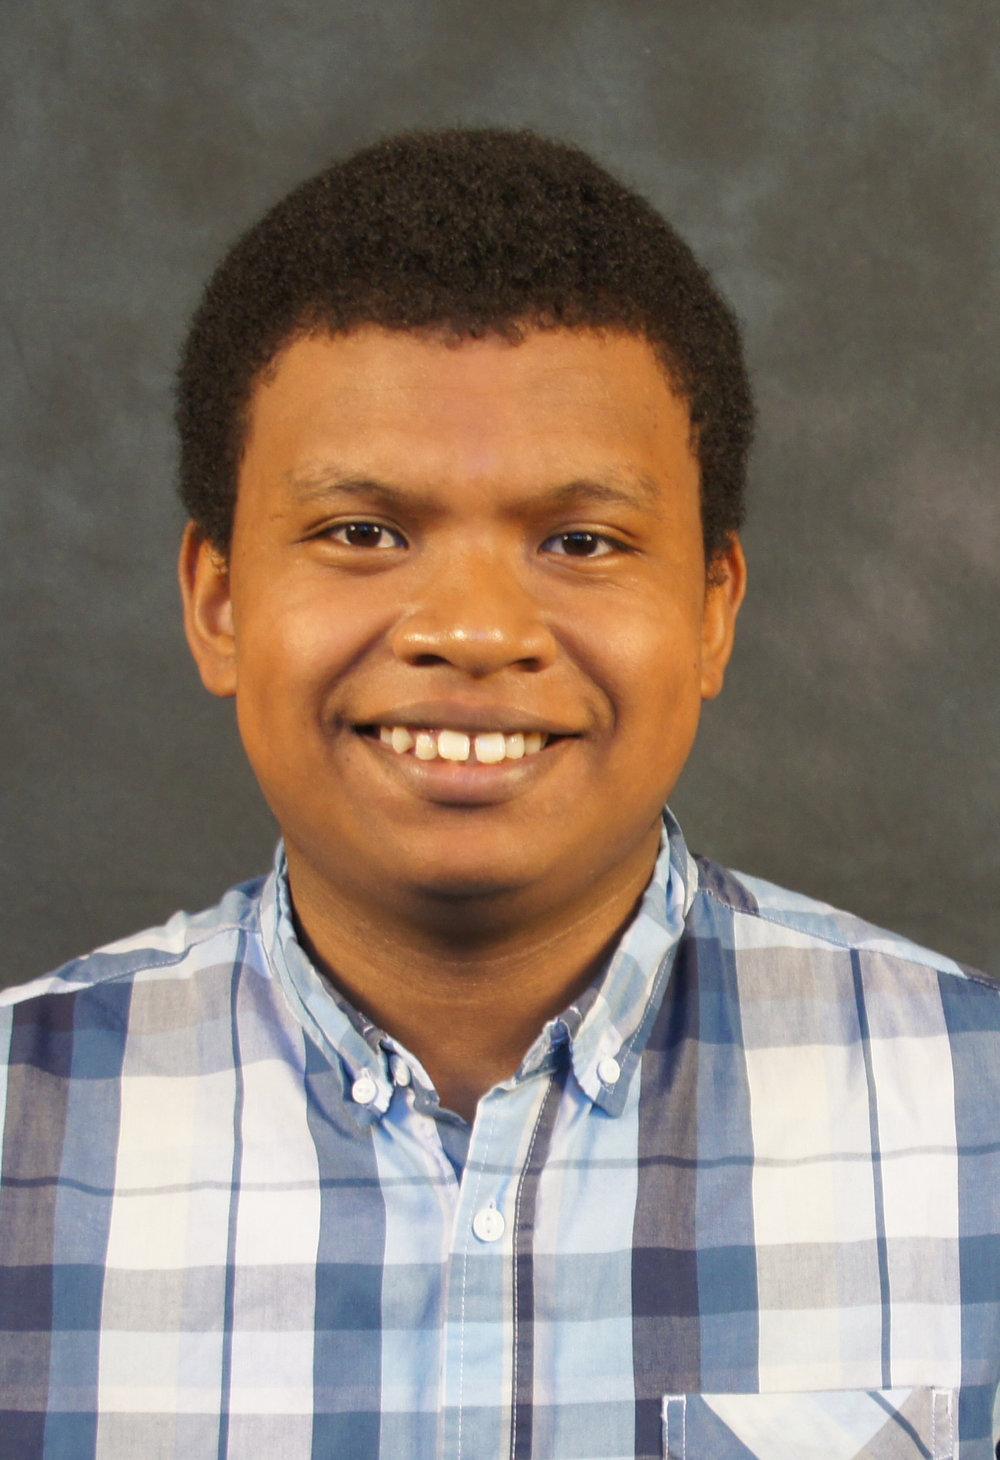 Jeffrey Hernandez Villarreal  Computer & Information Sciences, Freshman University of North Carolina at Greensboro  David & Mary Mounts Scholarship